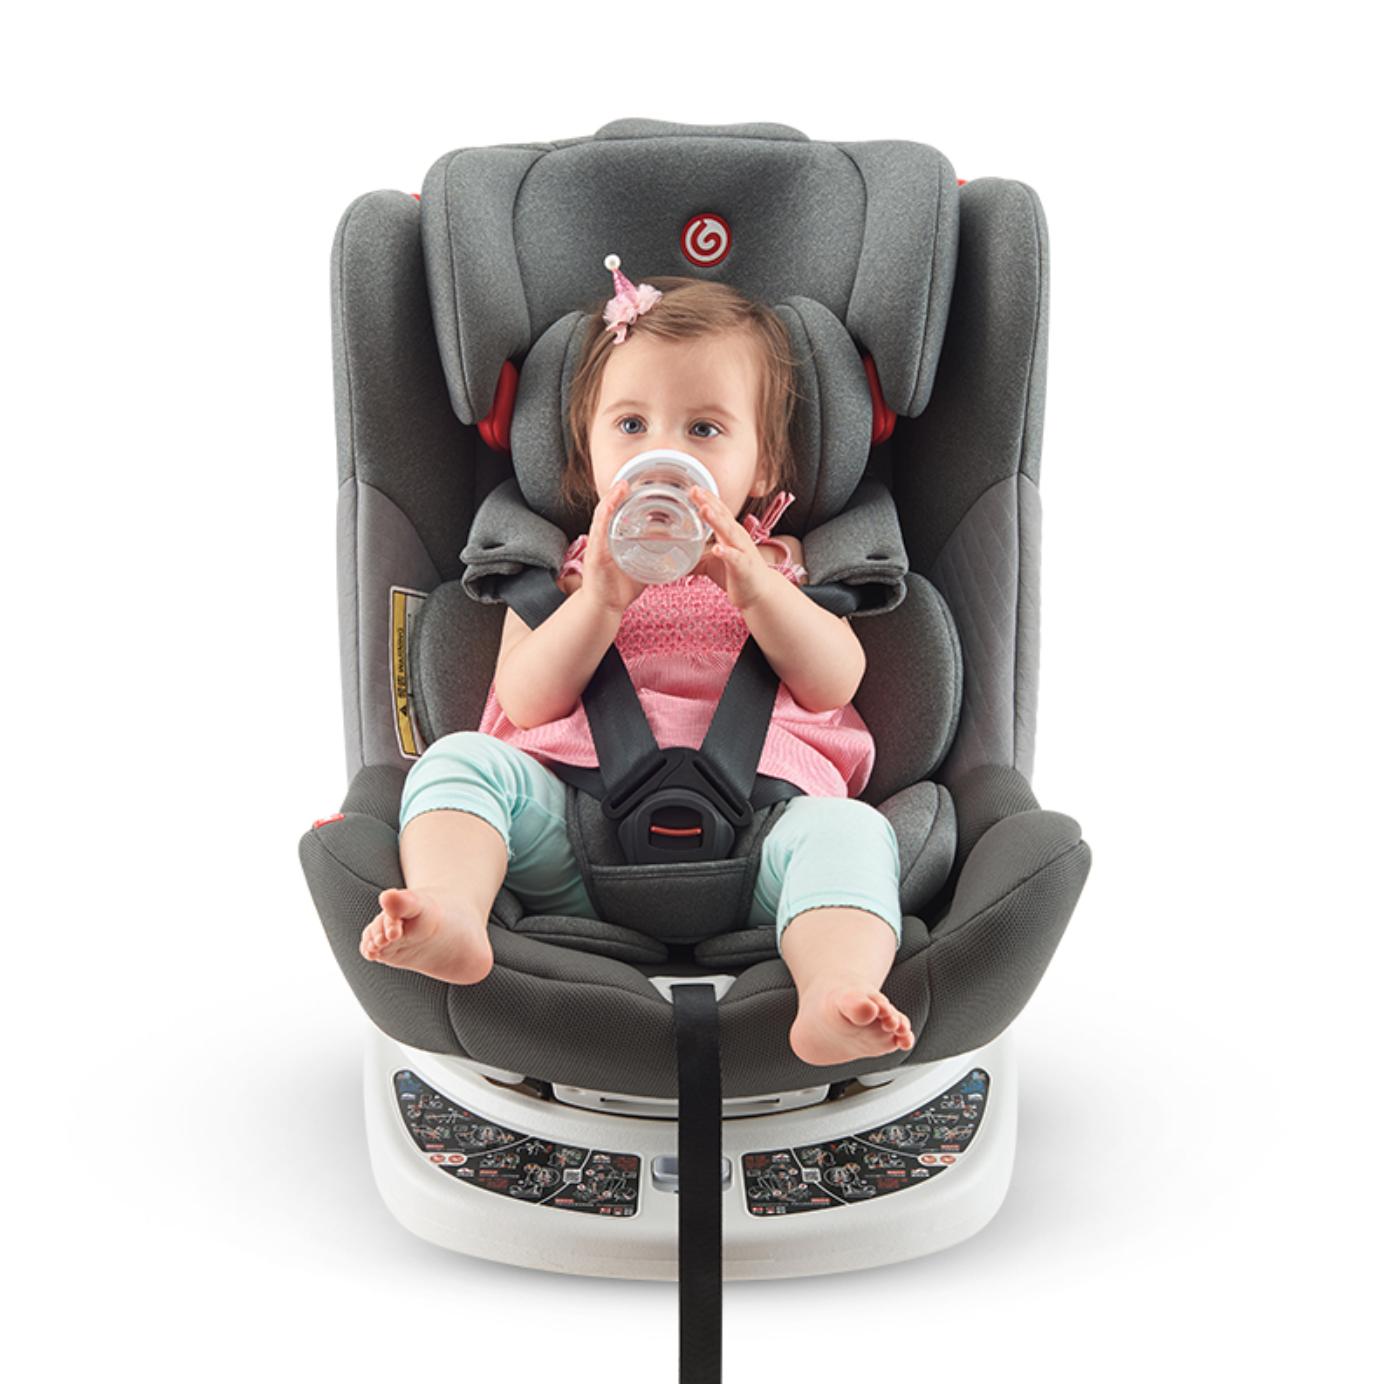 Ganen 感恩 X31-02 安全座椅 0-12岁 银河灰